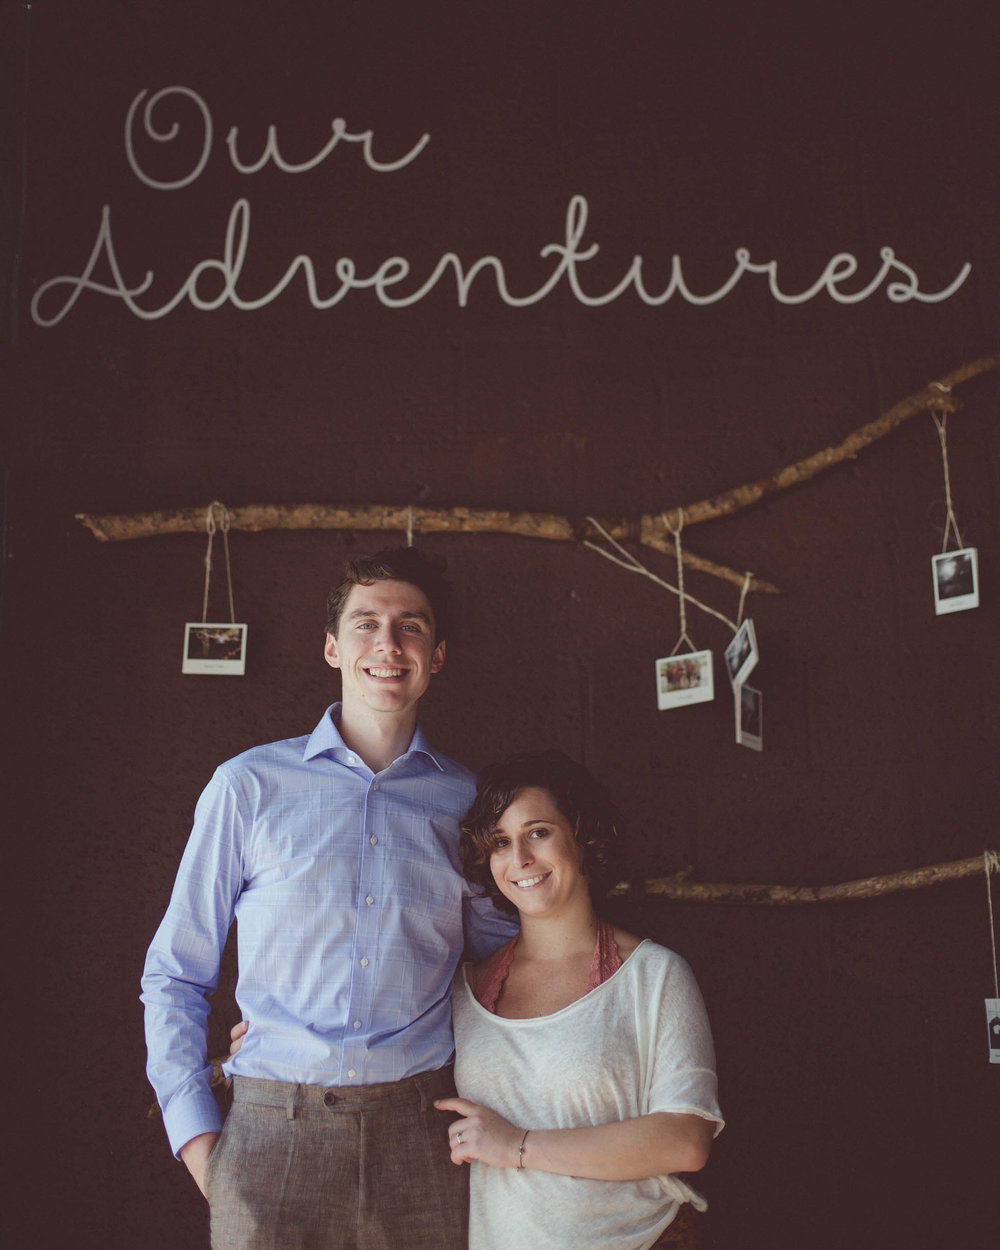 tiny_house_photo_engagement_photographer_adventures_traveling_wedding_photographer.jpg